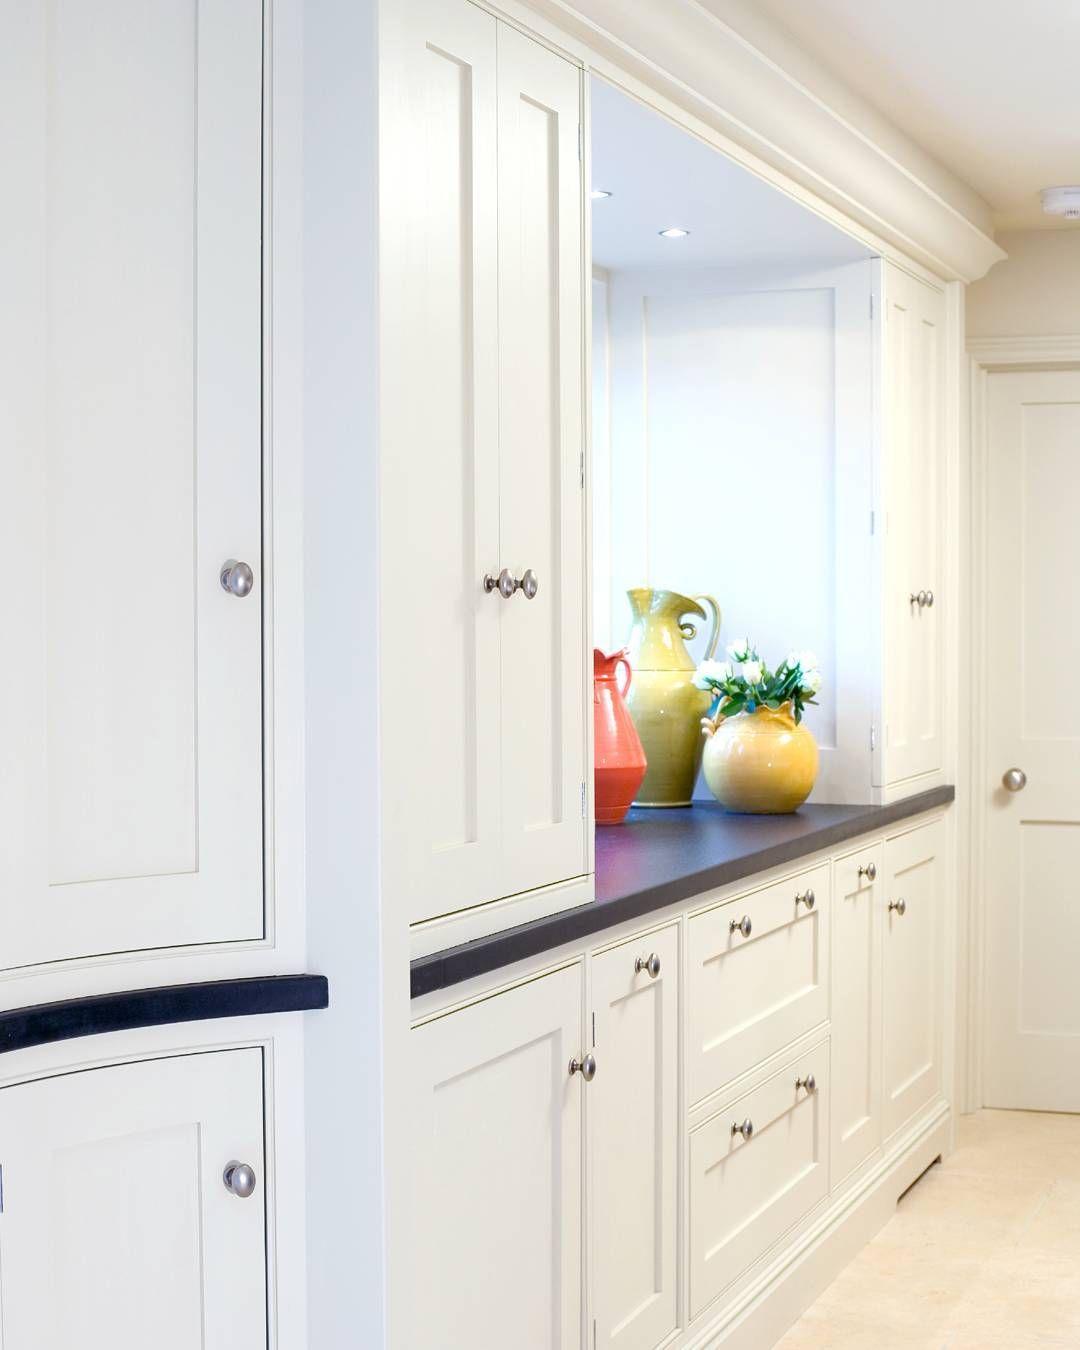 an elegant kitchen storage elegant kitchens kitchen kitchen storage on kitchen organization elegant id=68090